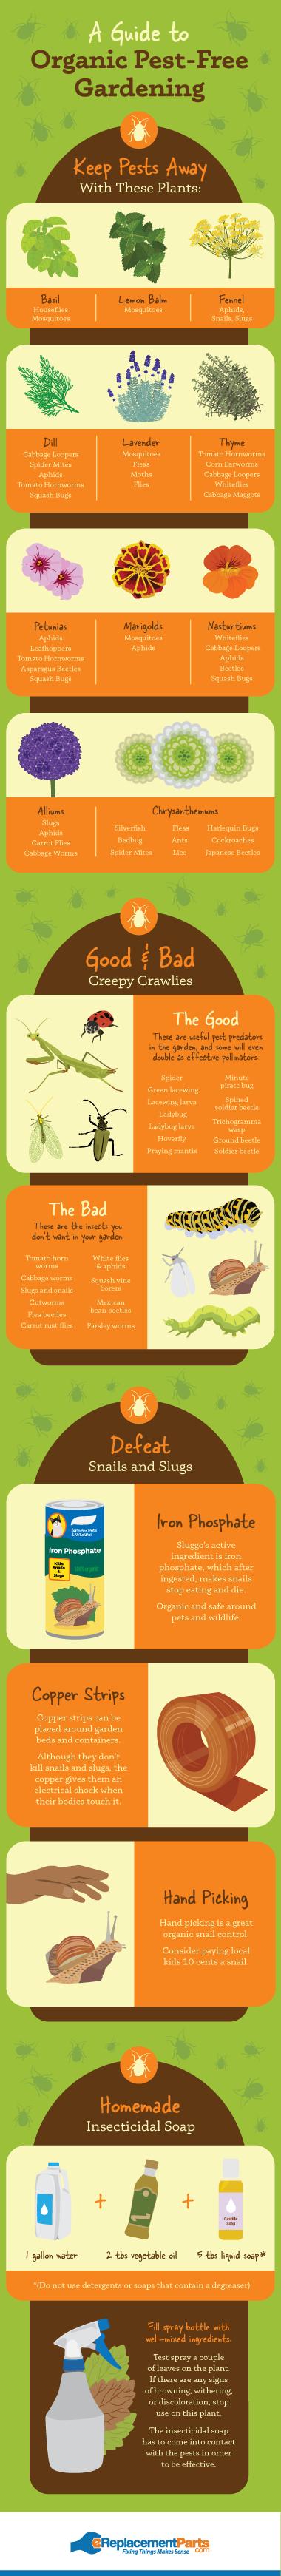 Organic Pest Solutions